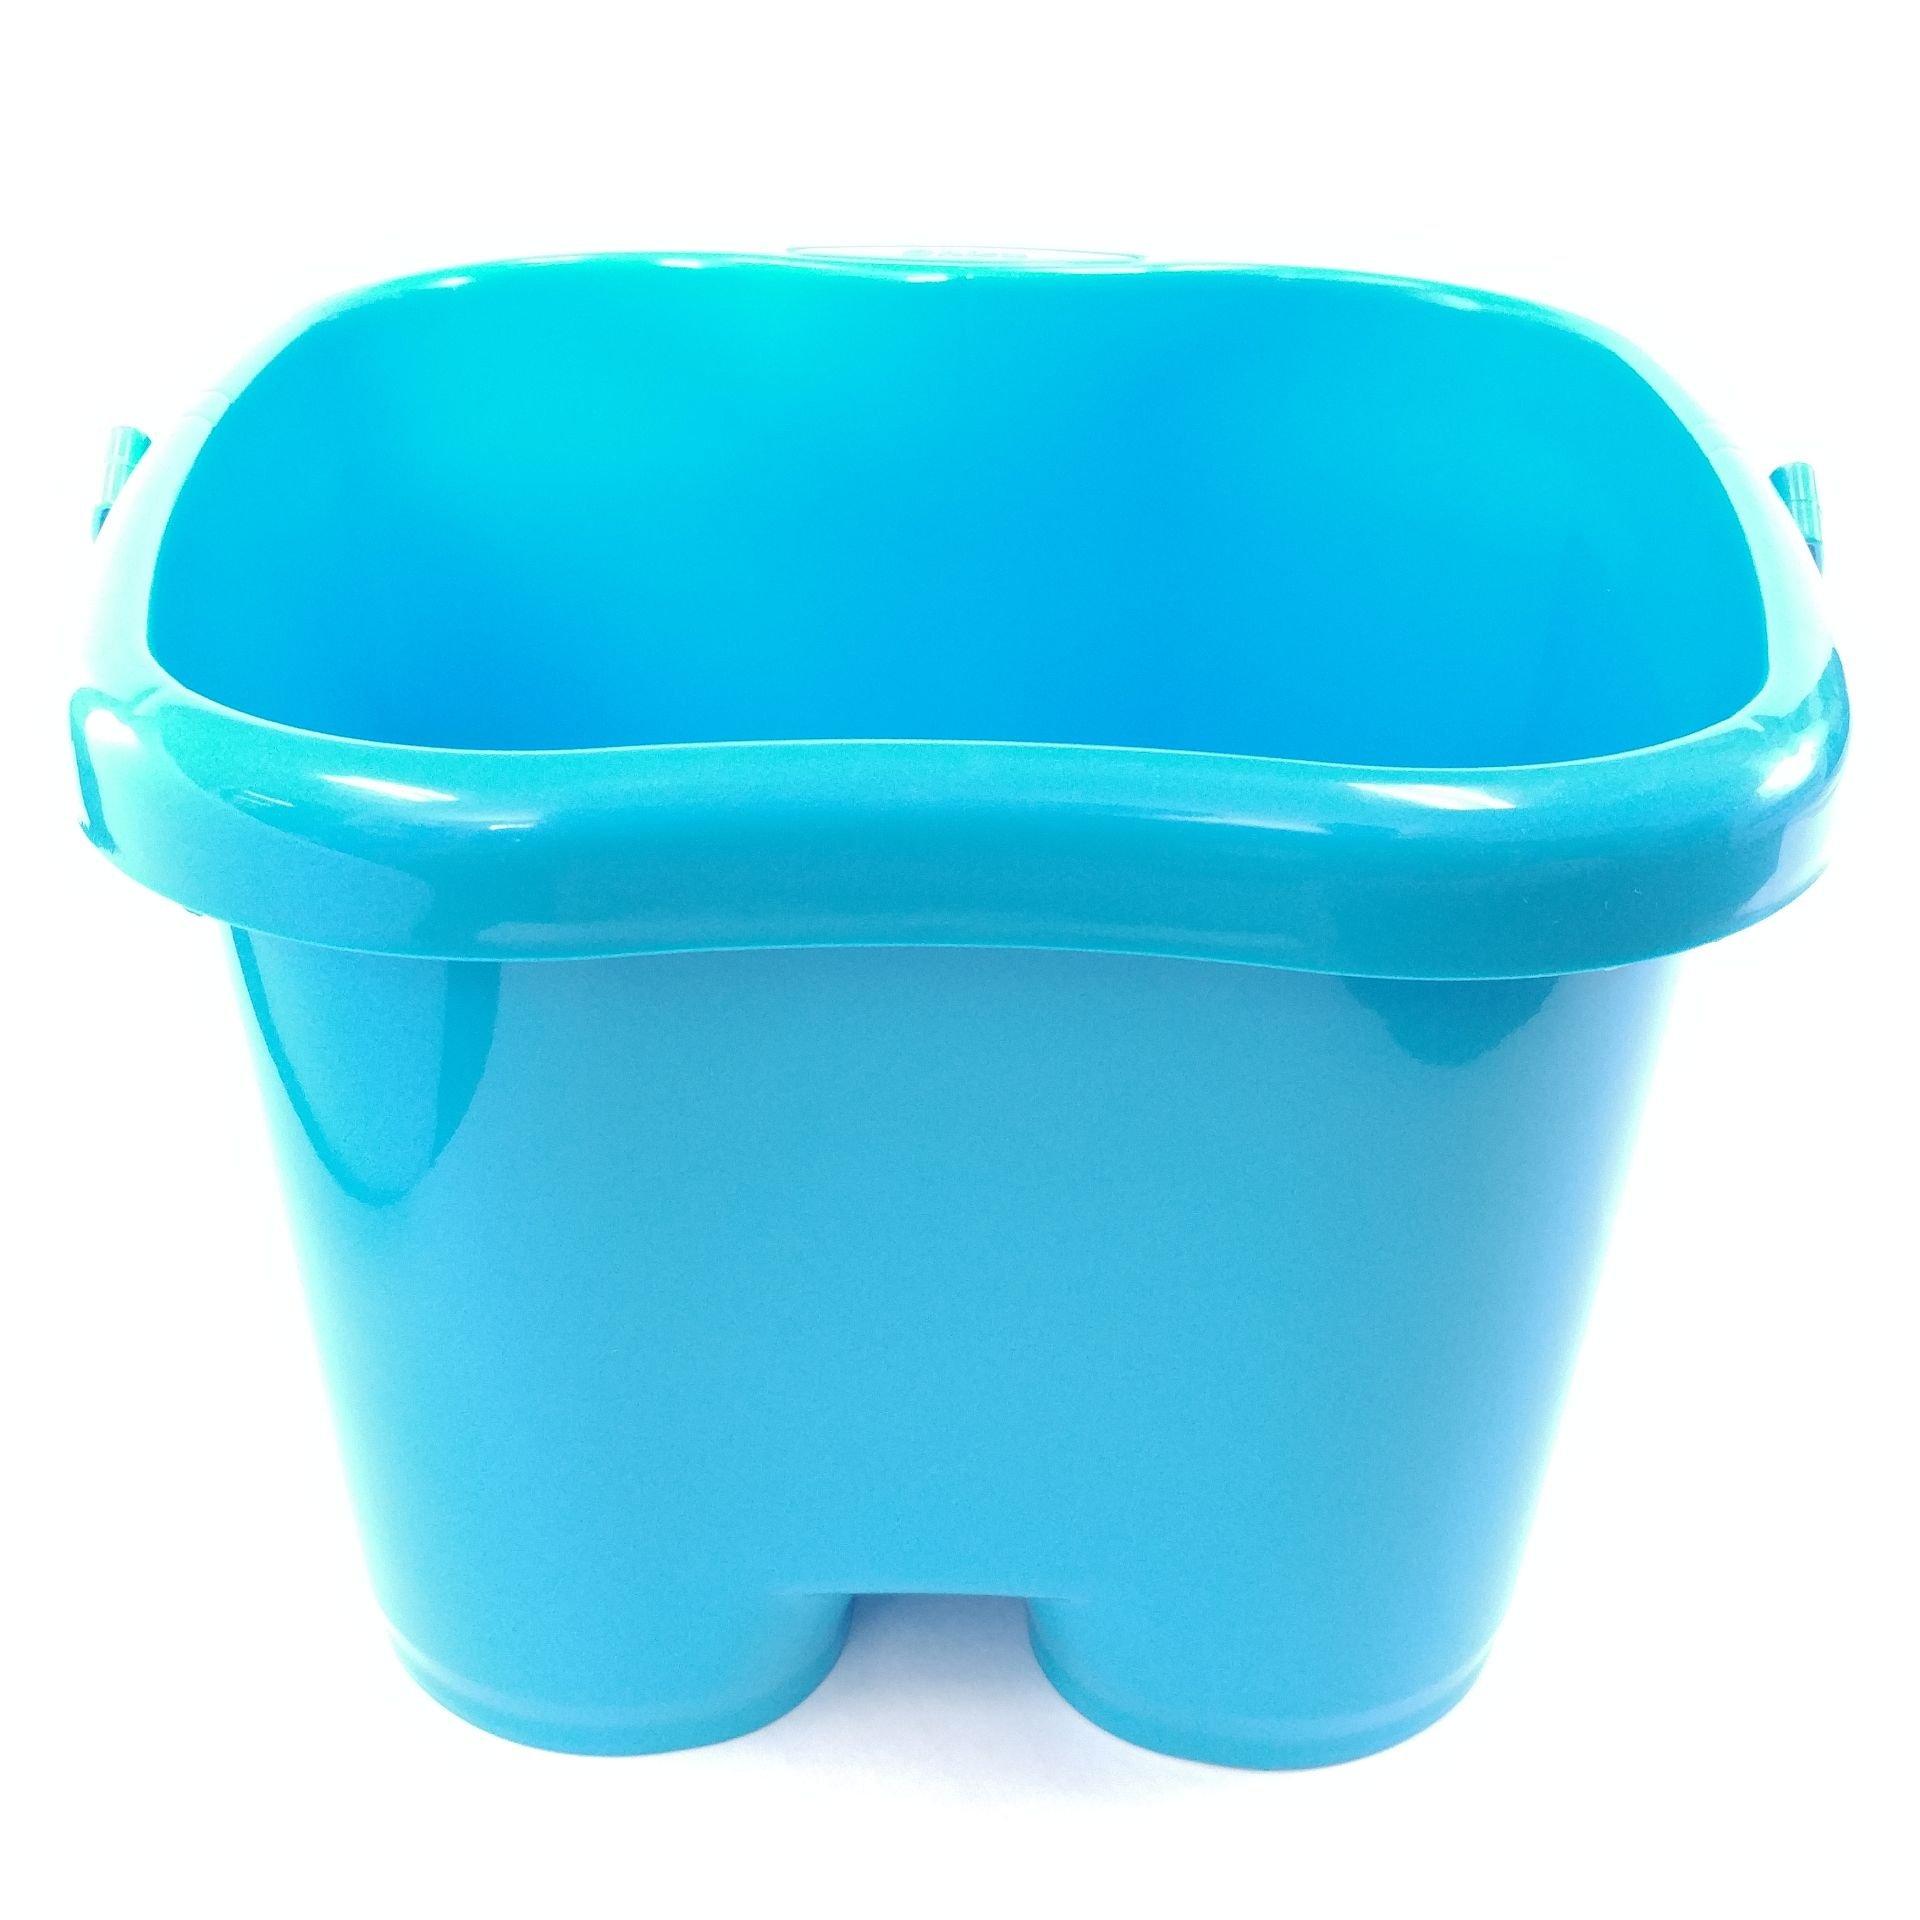 Ohisu Blue Foot Basin for Foot Bath, Soak, or Detox by Ohisu (Image #5)